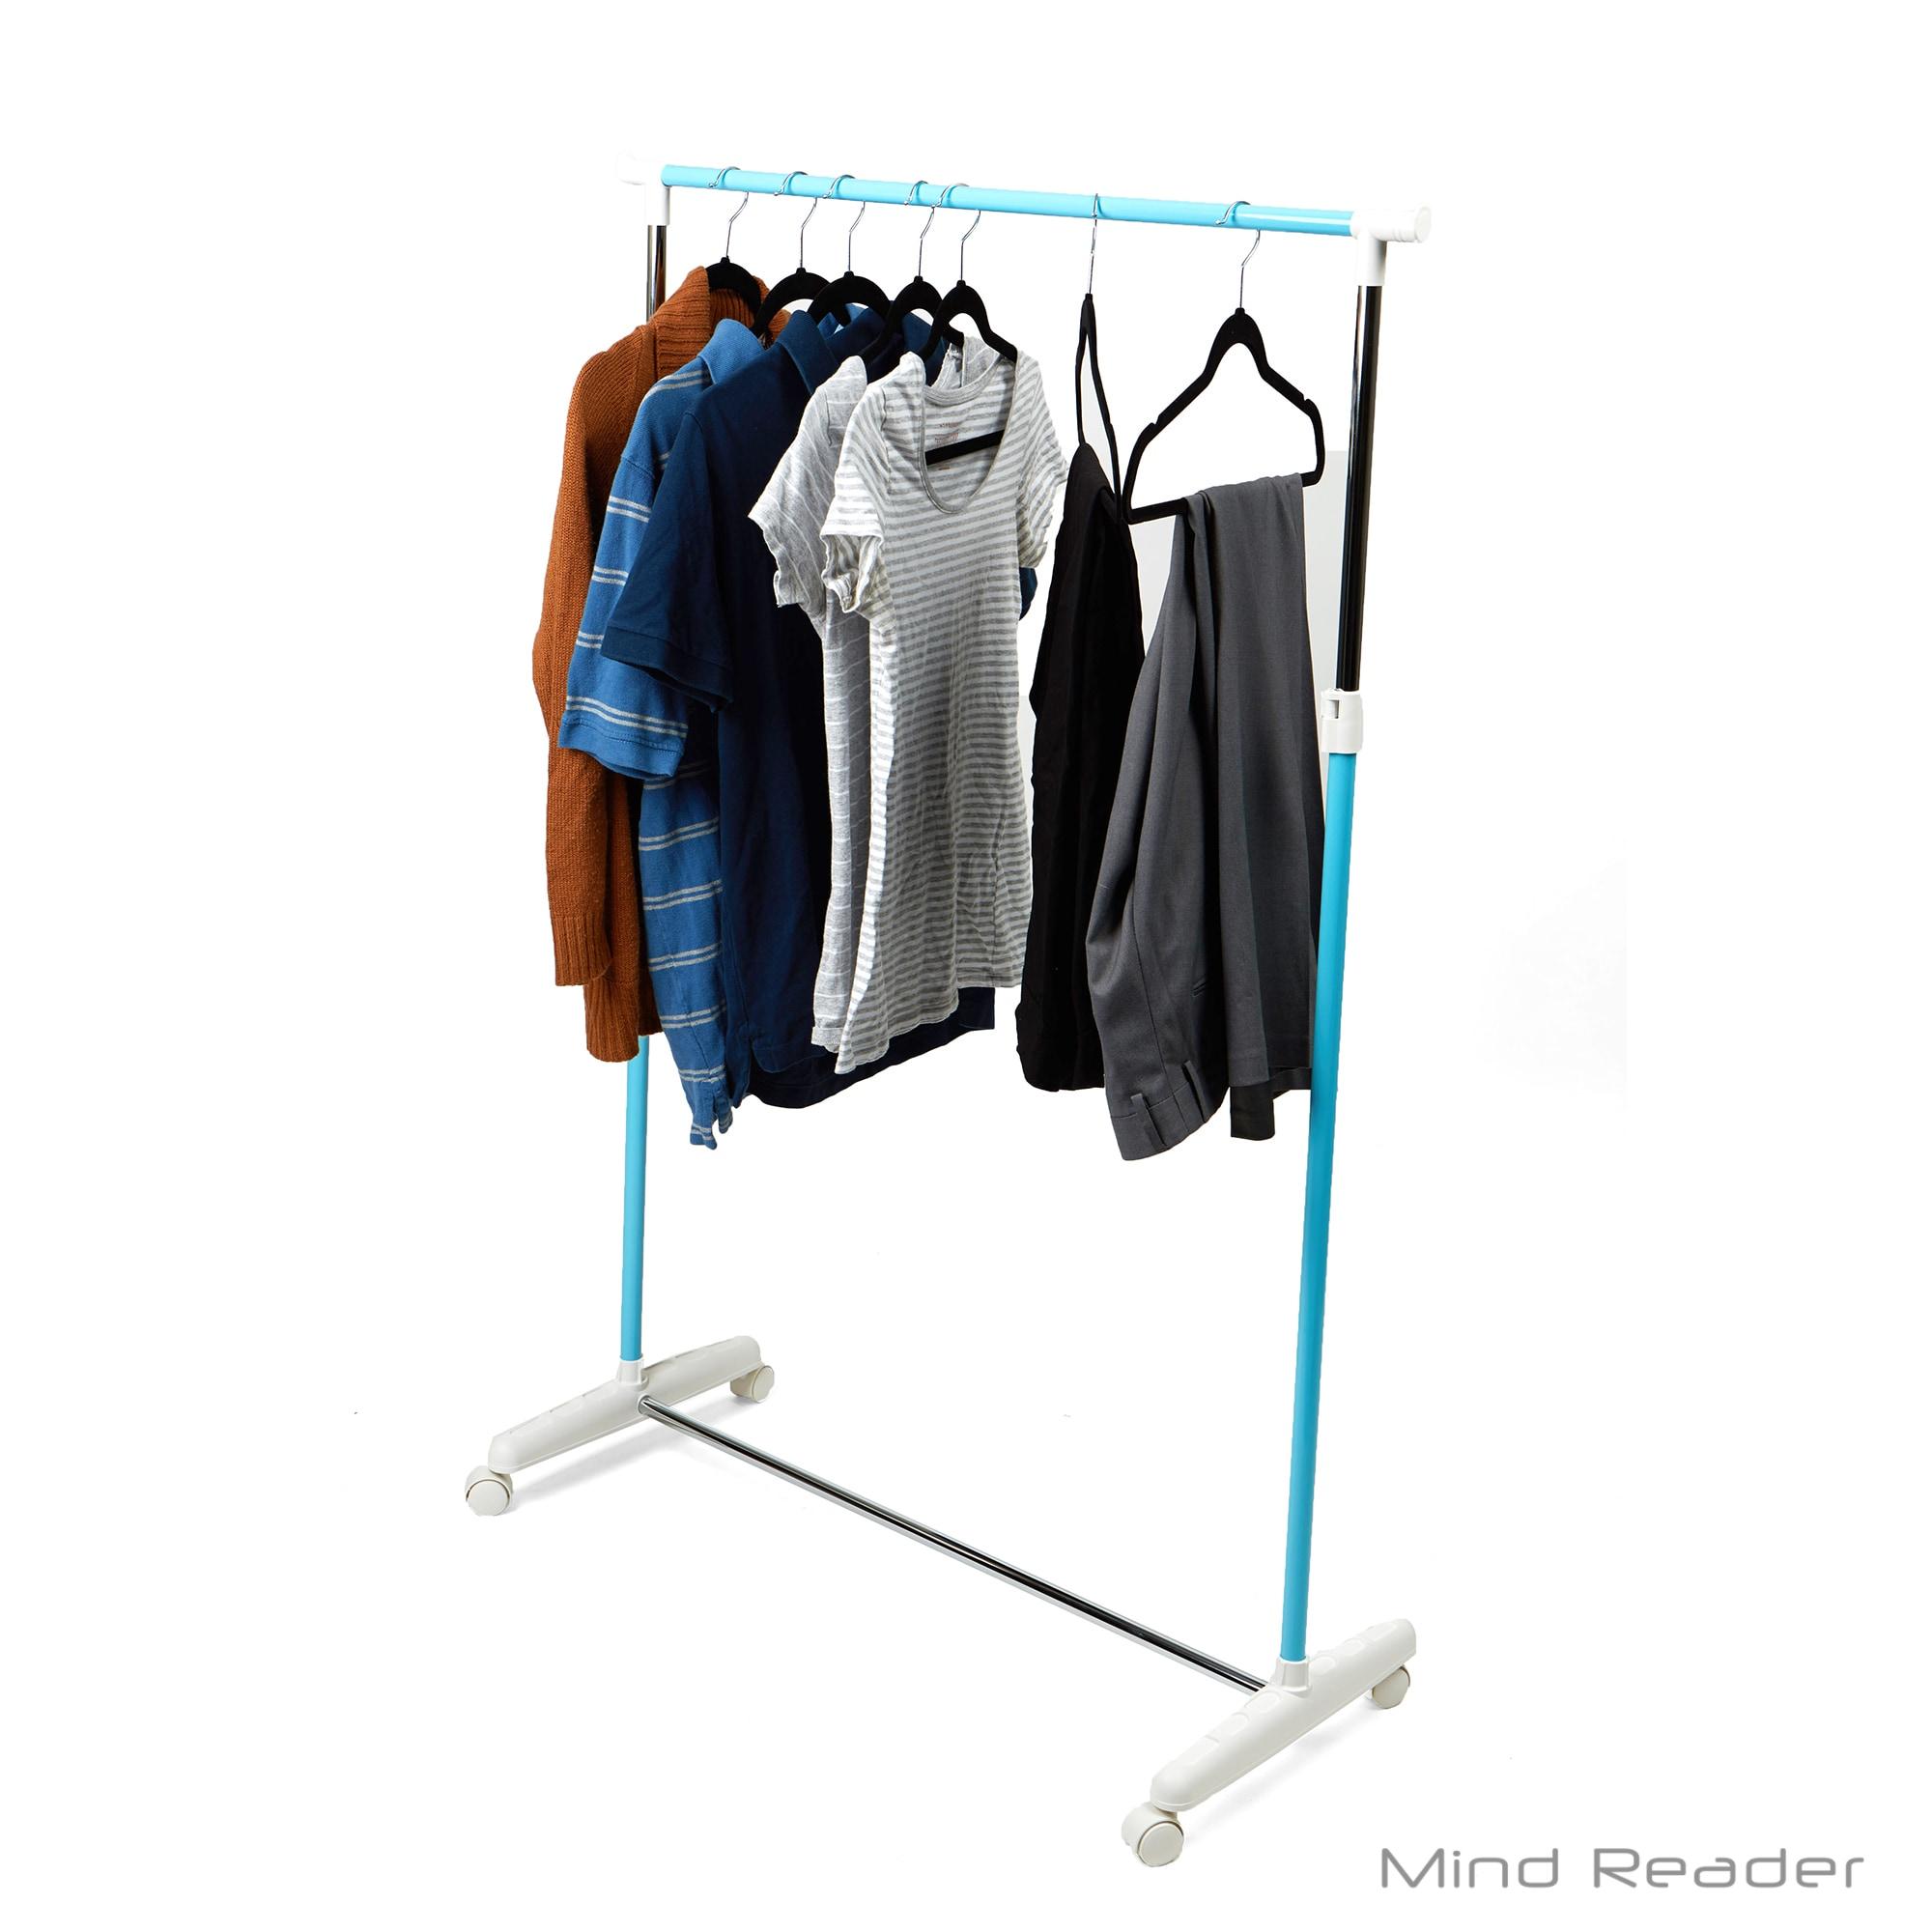 Shop mind reader metal single rolling garment rack blue free shipping on orders over 45 overstock com 20178016